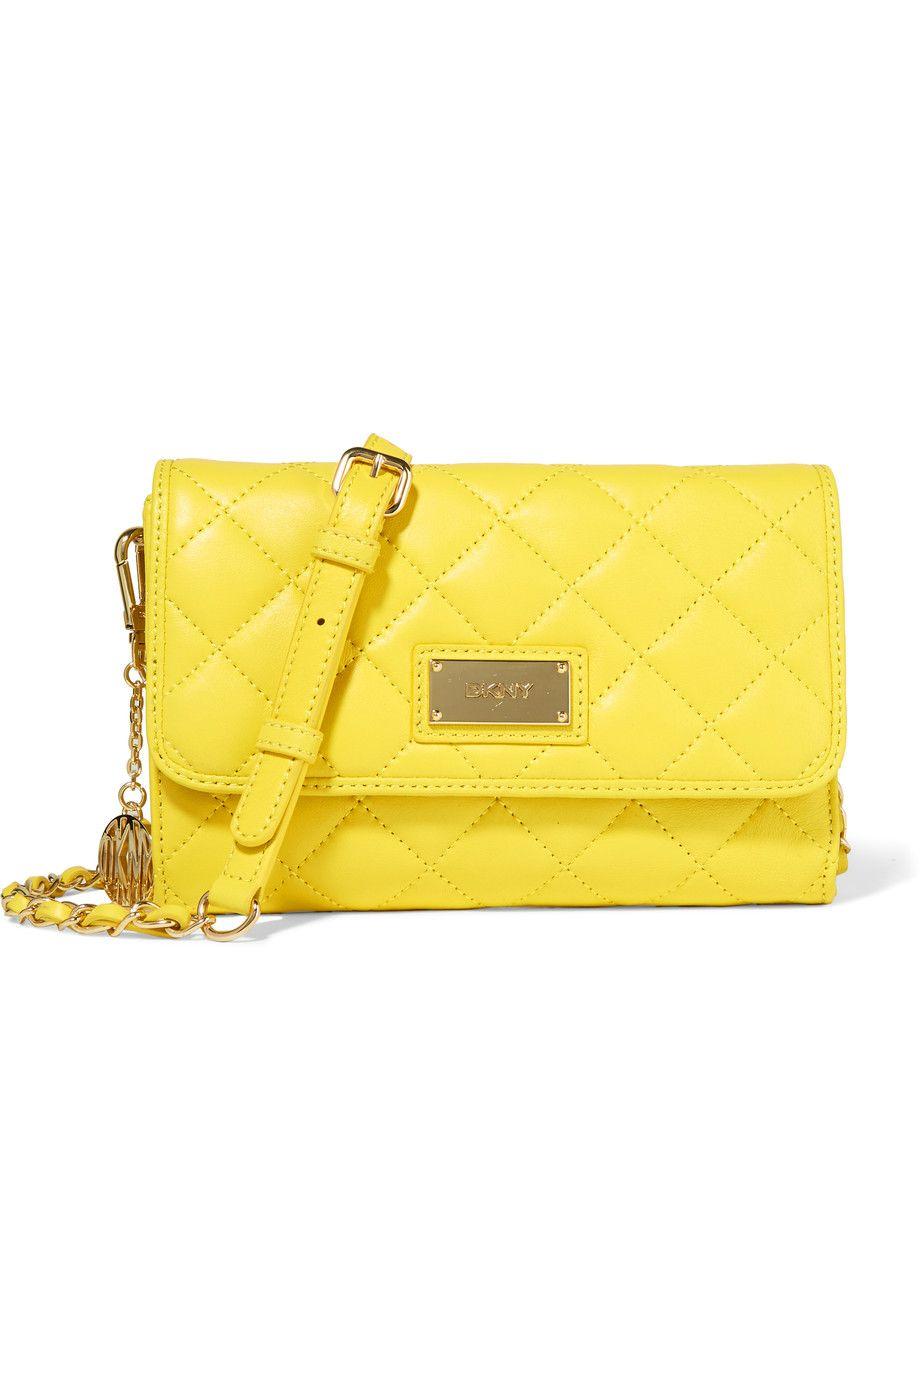 DKNY Quilted Leather Shoulder Bag. #dkny #bags #shoulder bags #leather #glitter #